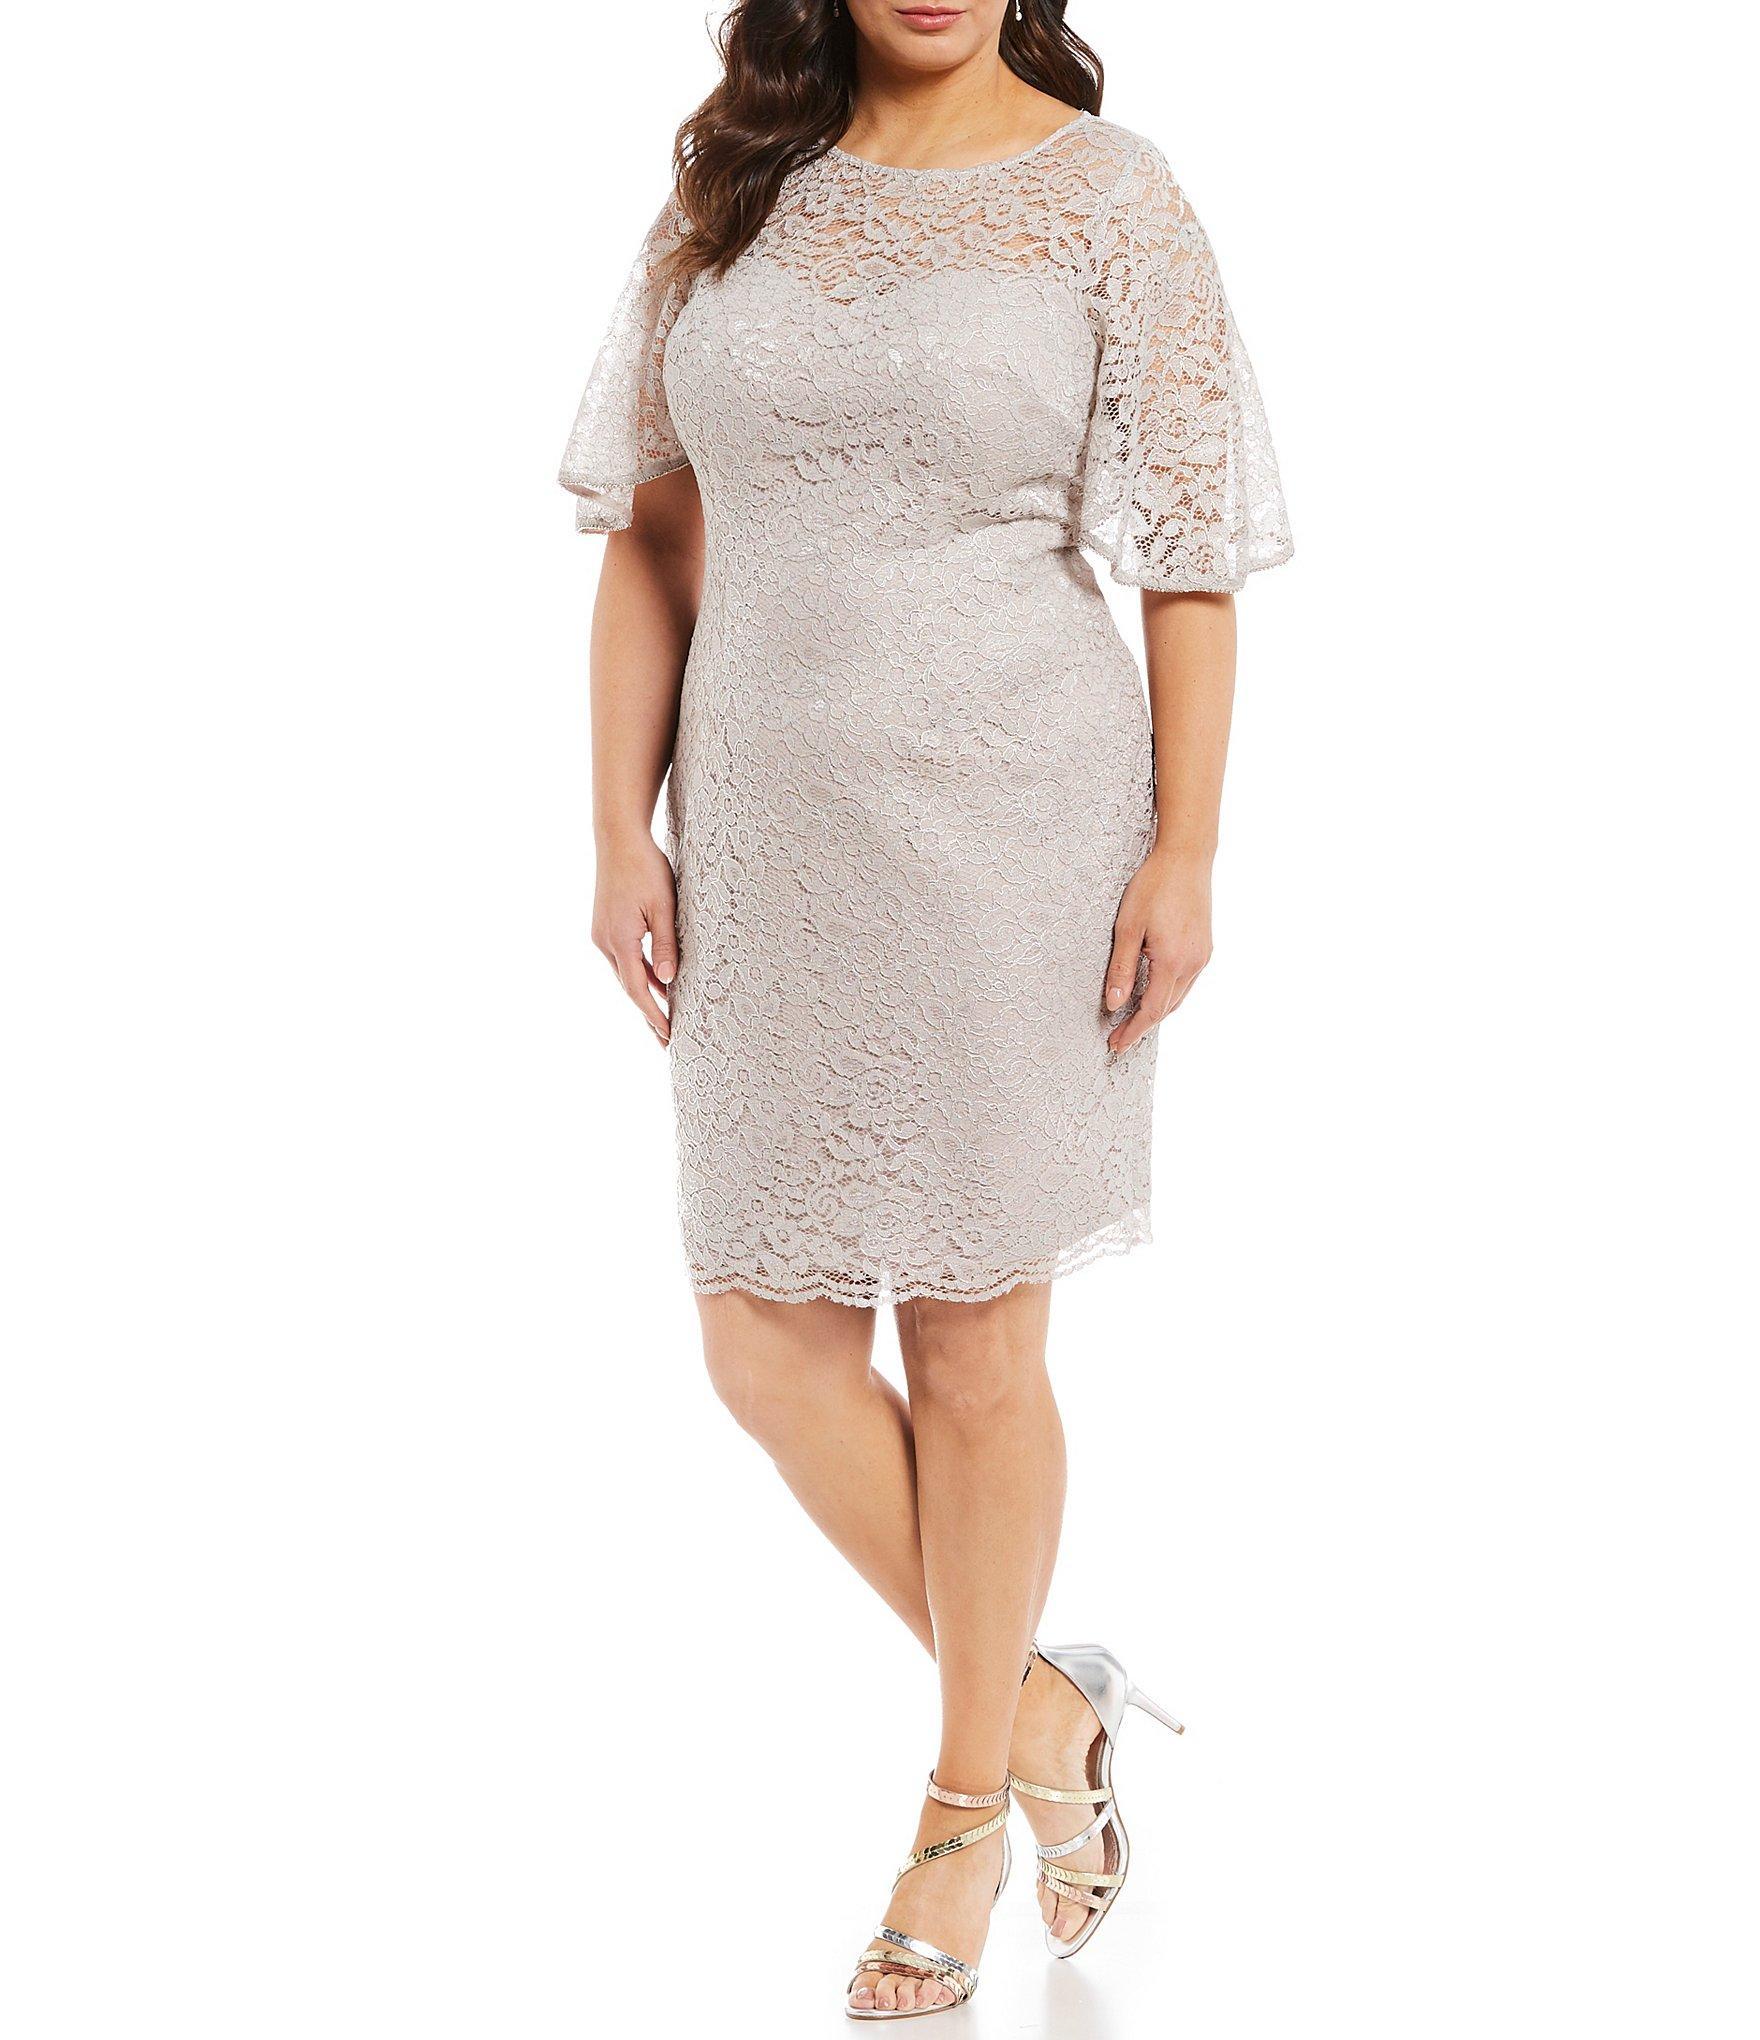 ac68eaaed9a Adrianna Papell. Women s Plus Size Lace Sheath Dress